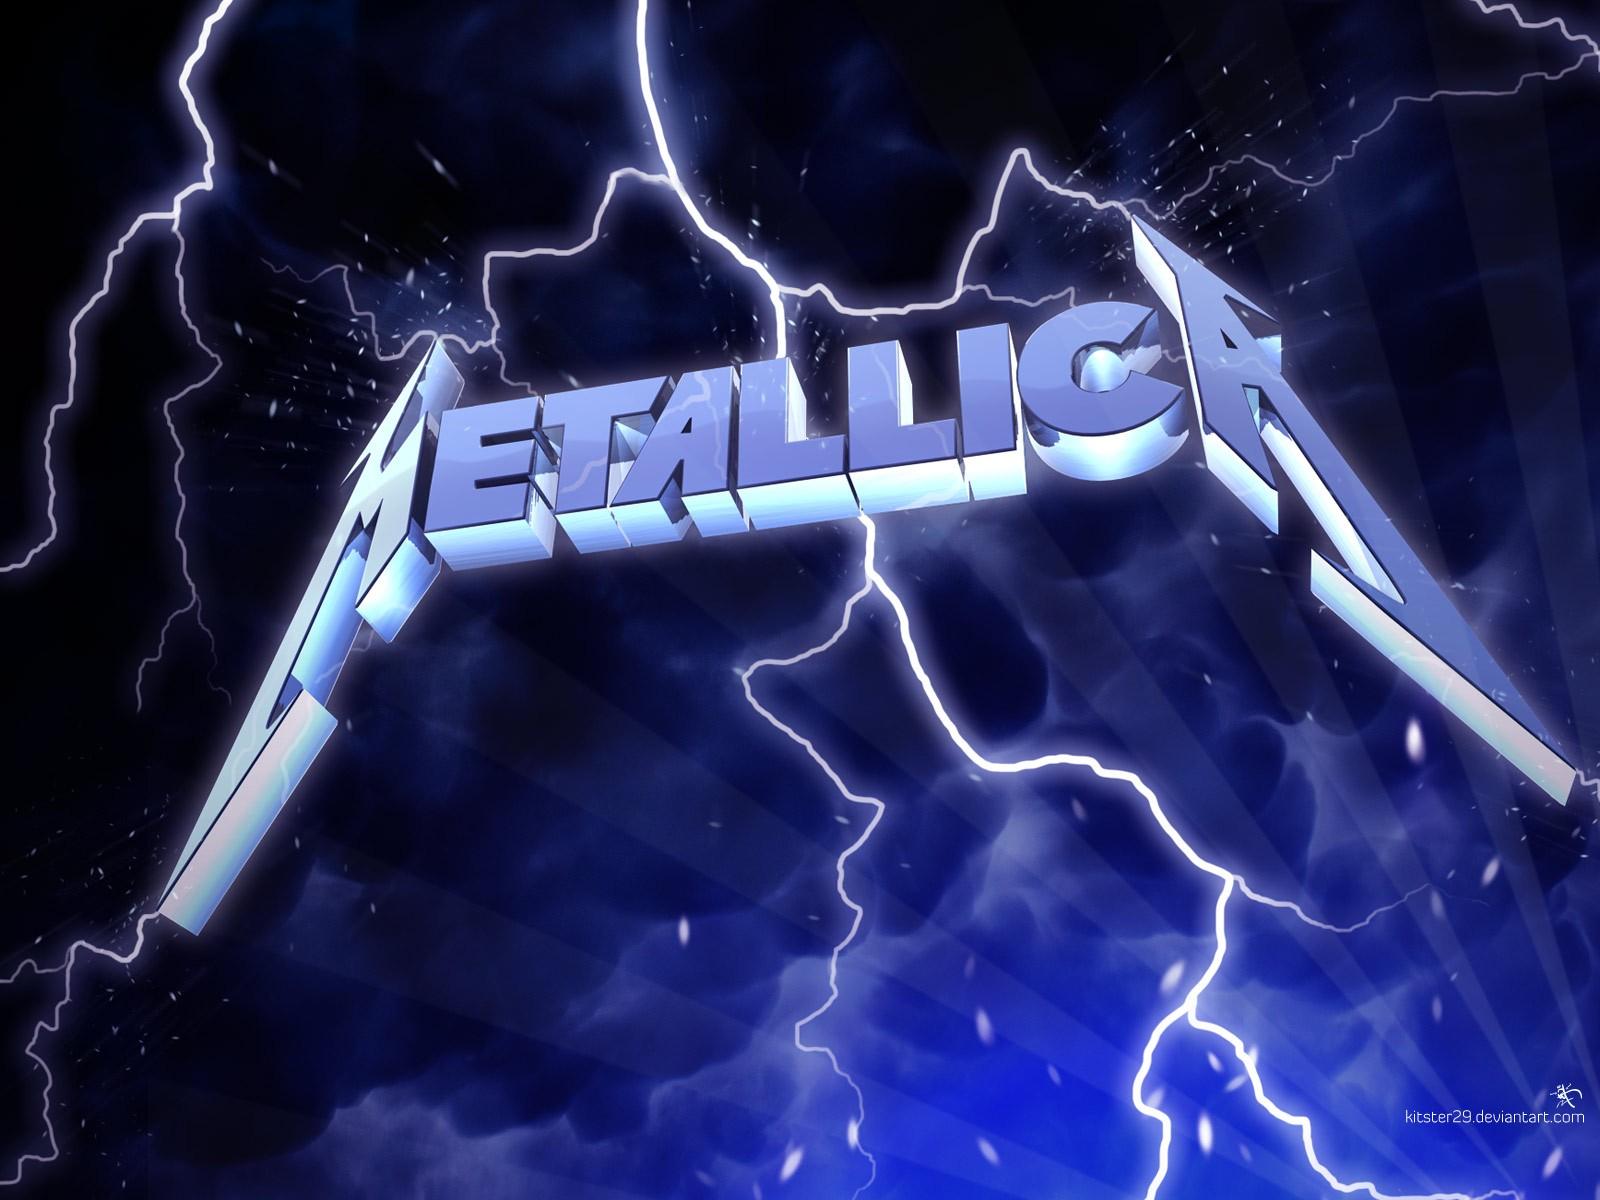 General 1600x1200 Metallica  heavy metal thrash metal Big 4  Thunderbolt music band logo